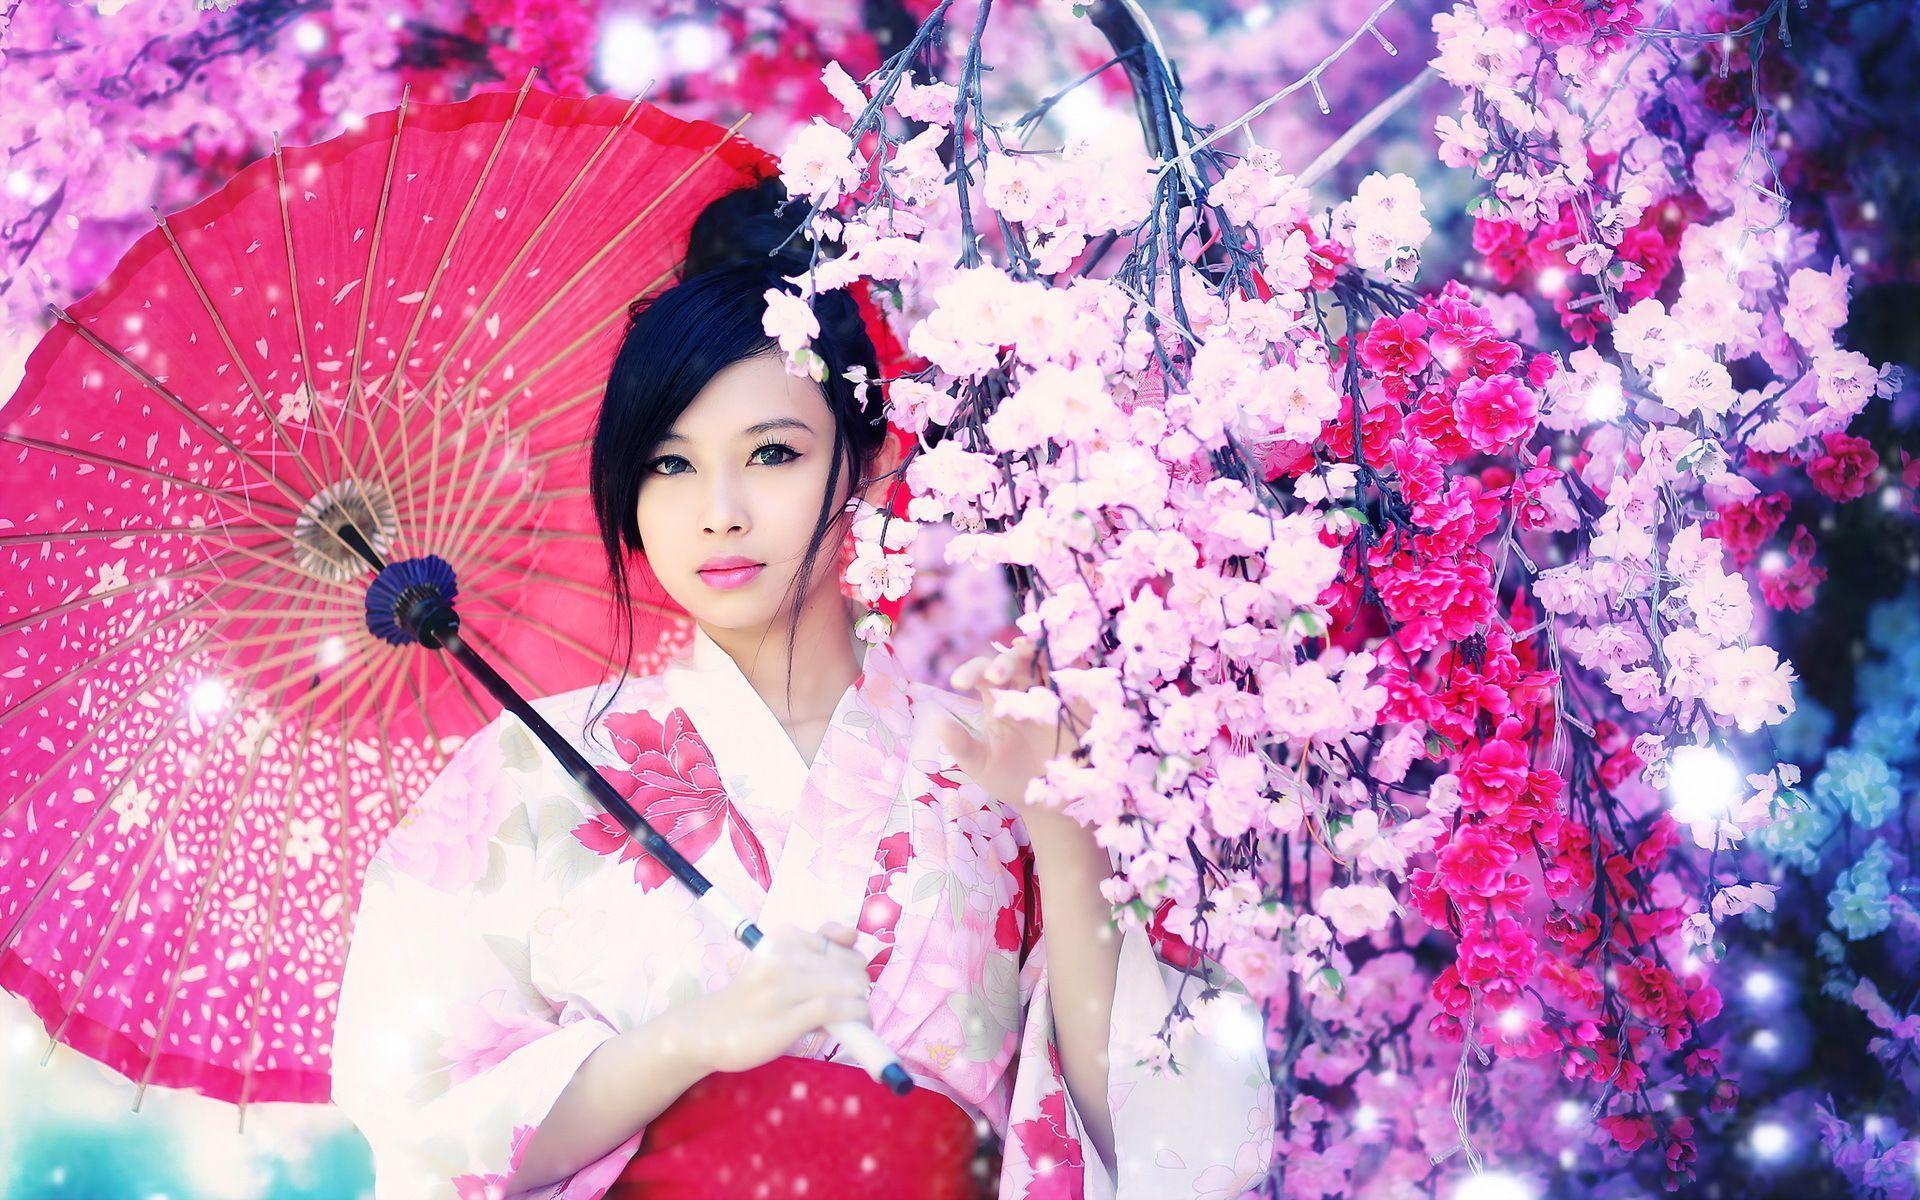 Pair Of Paintings, Asian Geisha Girls, Very Pretty